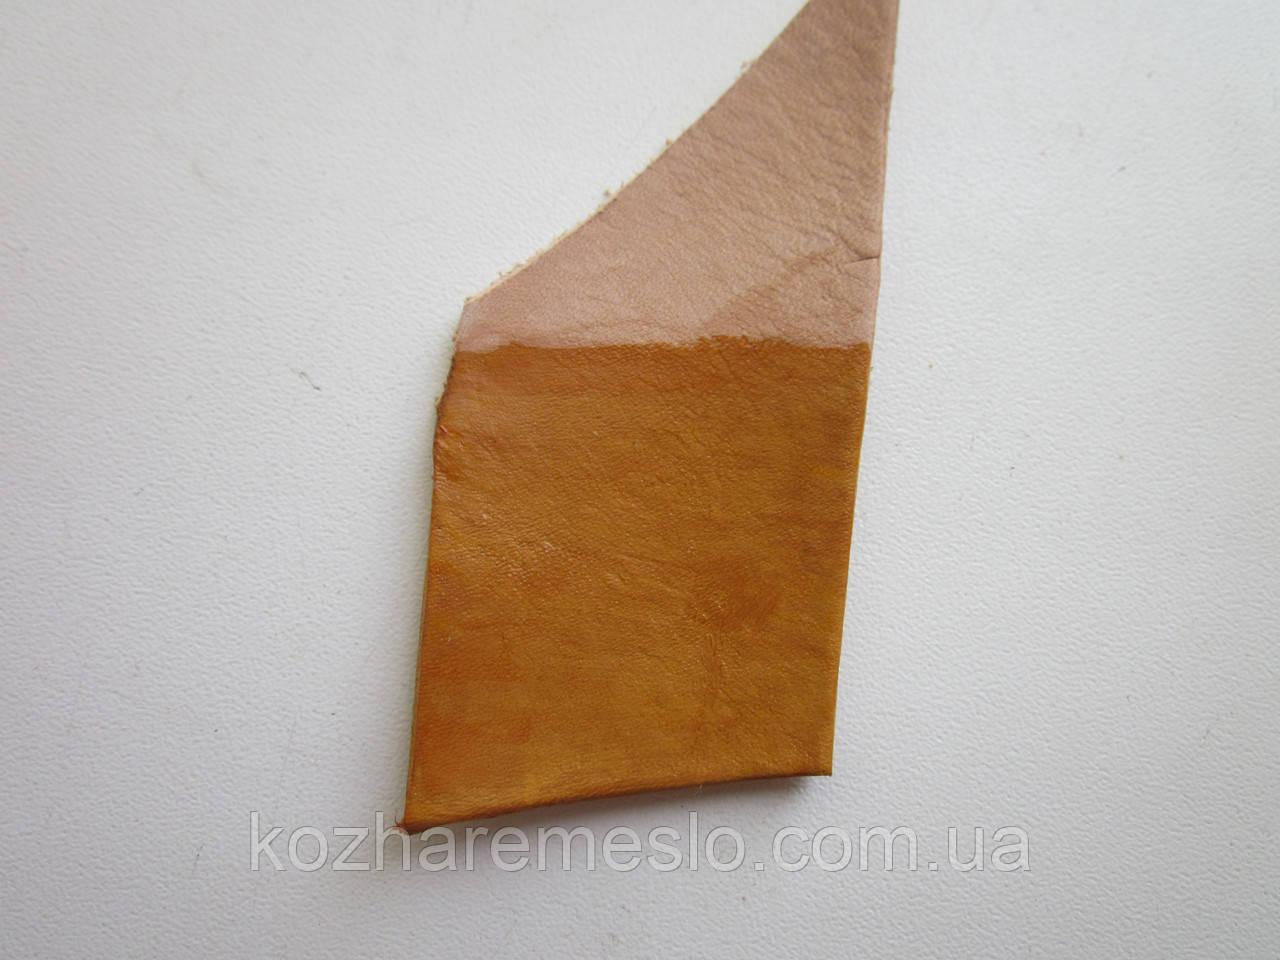 Краска для кожи WATERSTAIN Fenice на водной основе 100 мл светло - коричневая (Италия)